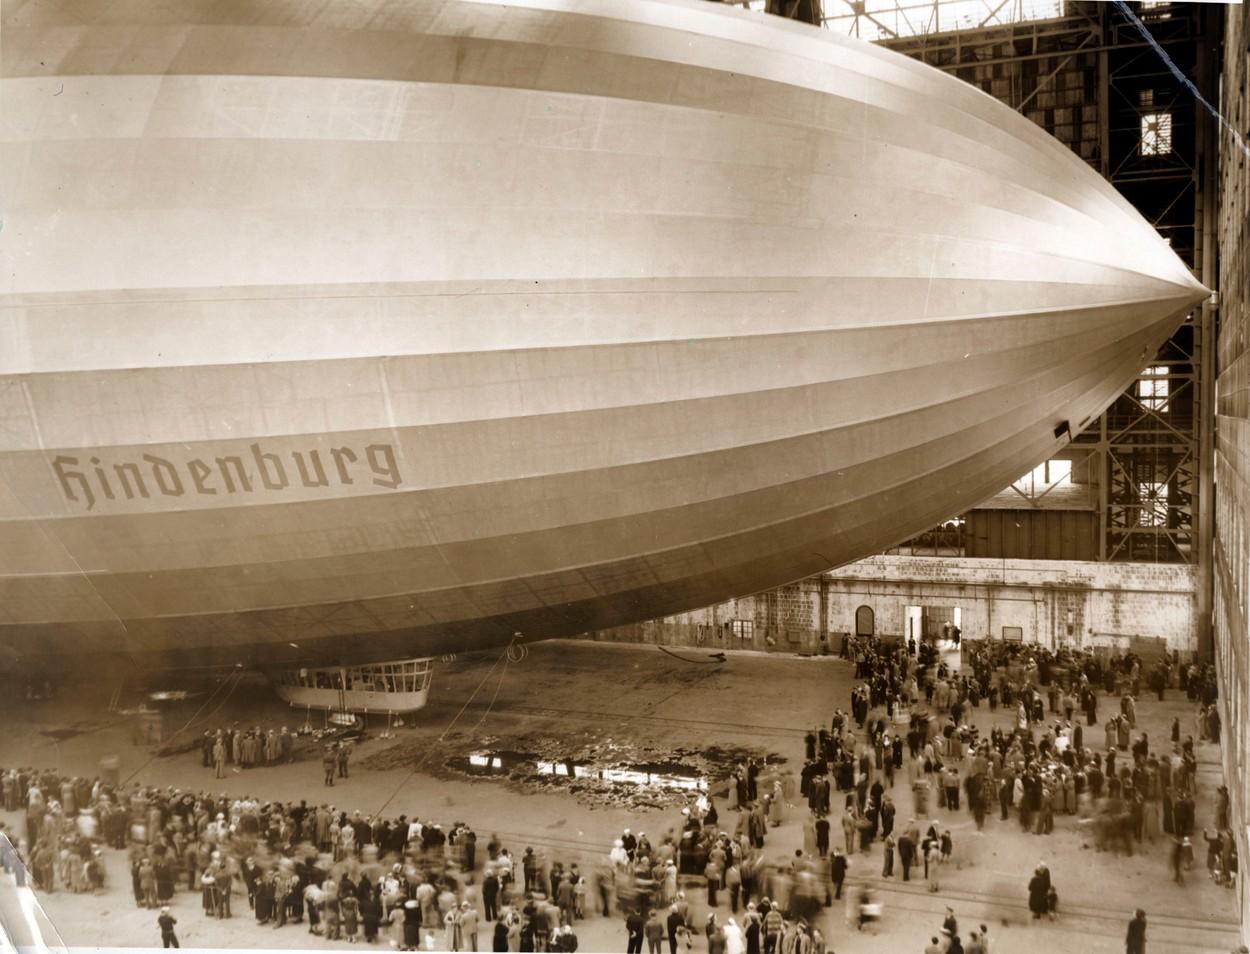 Hindenburg léghajó 1936-ban